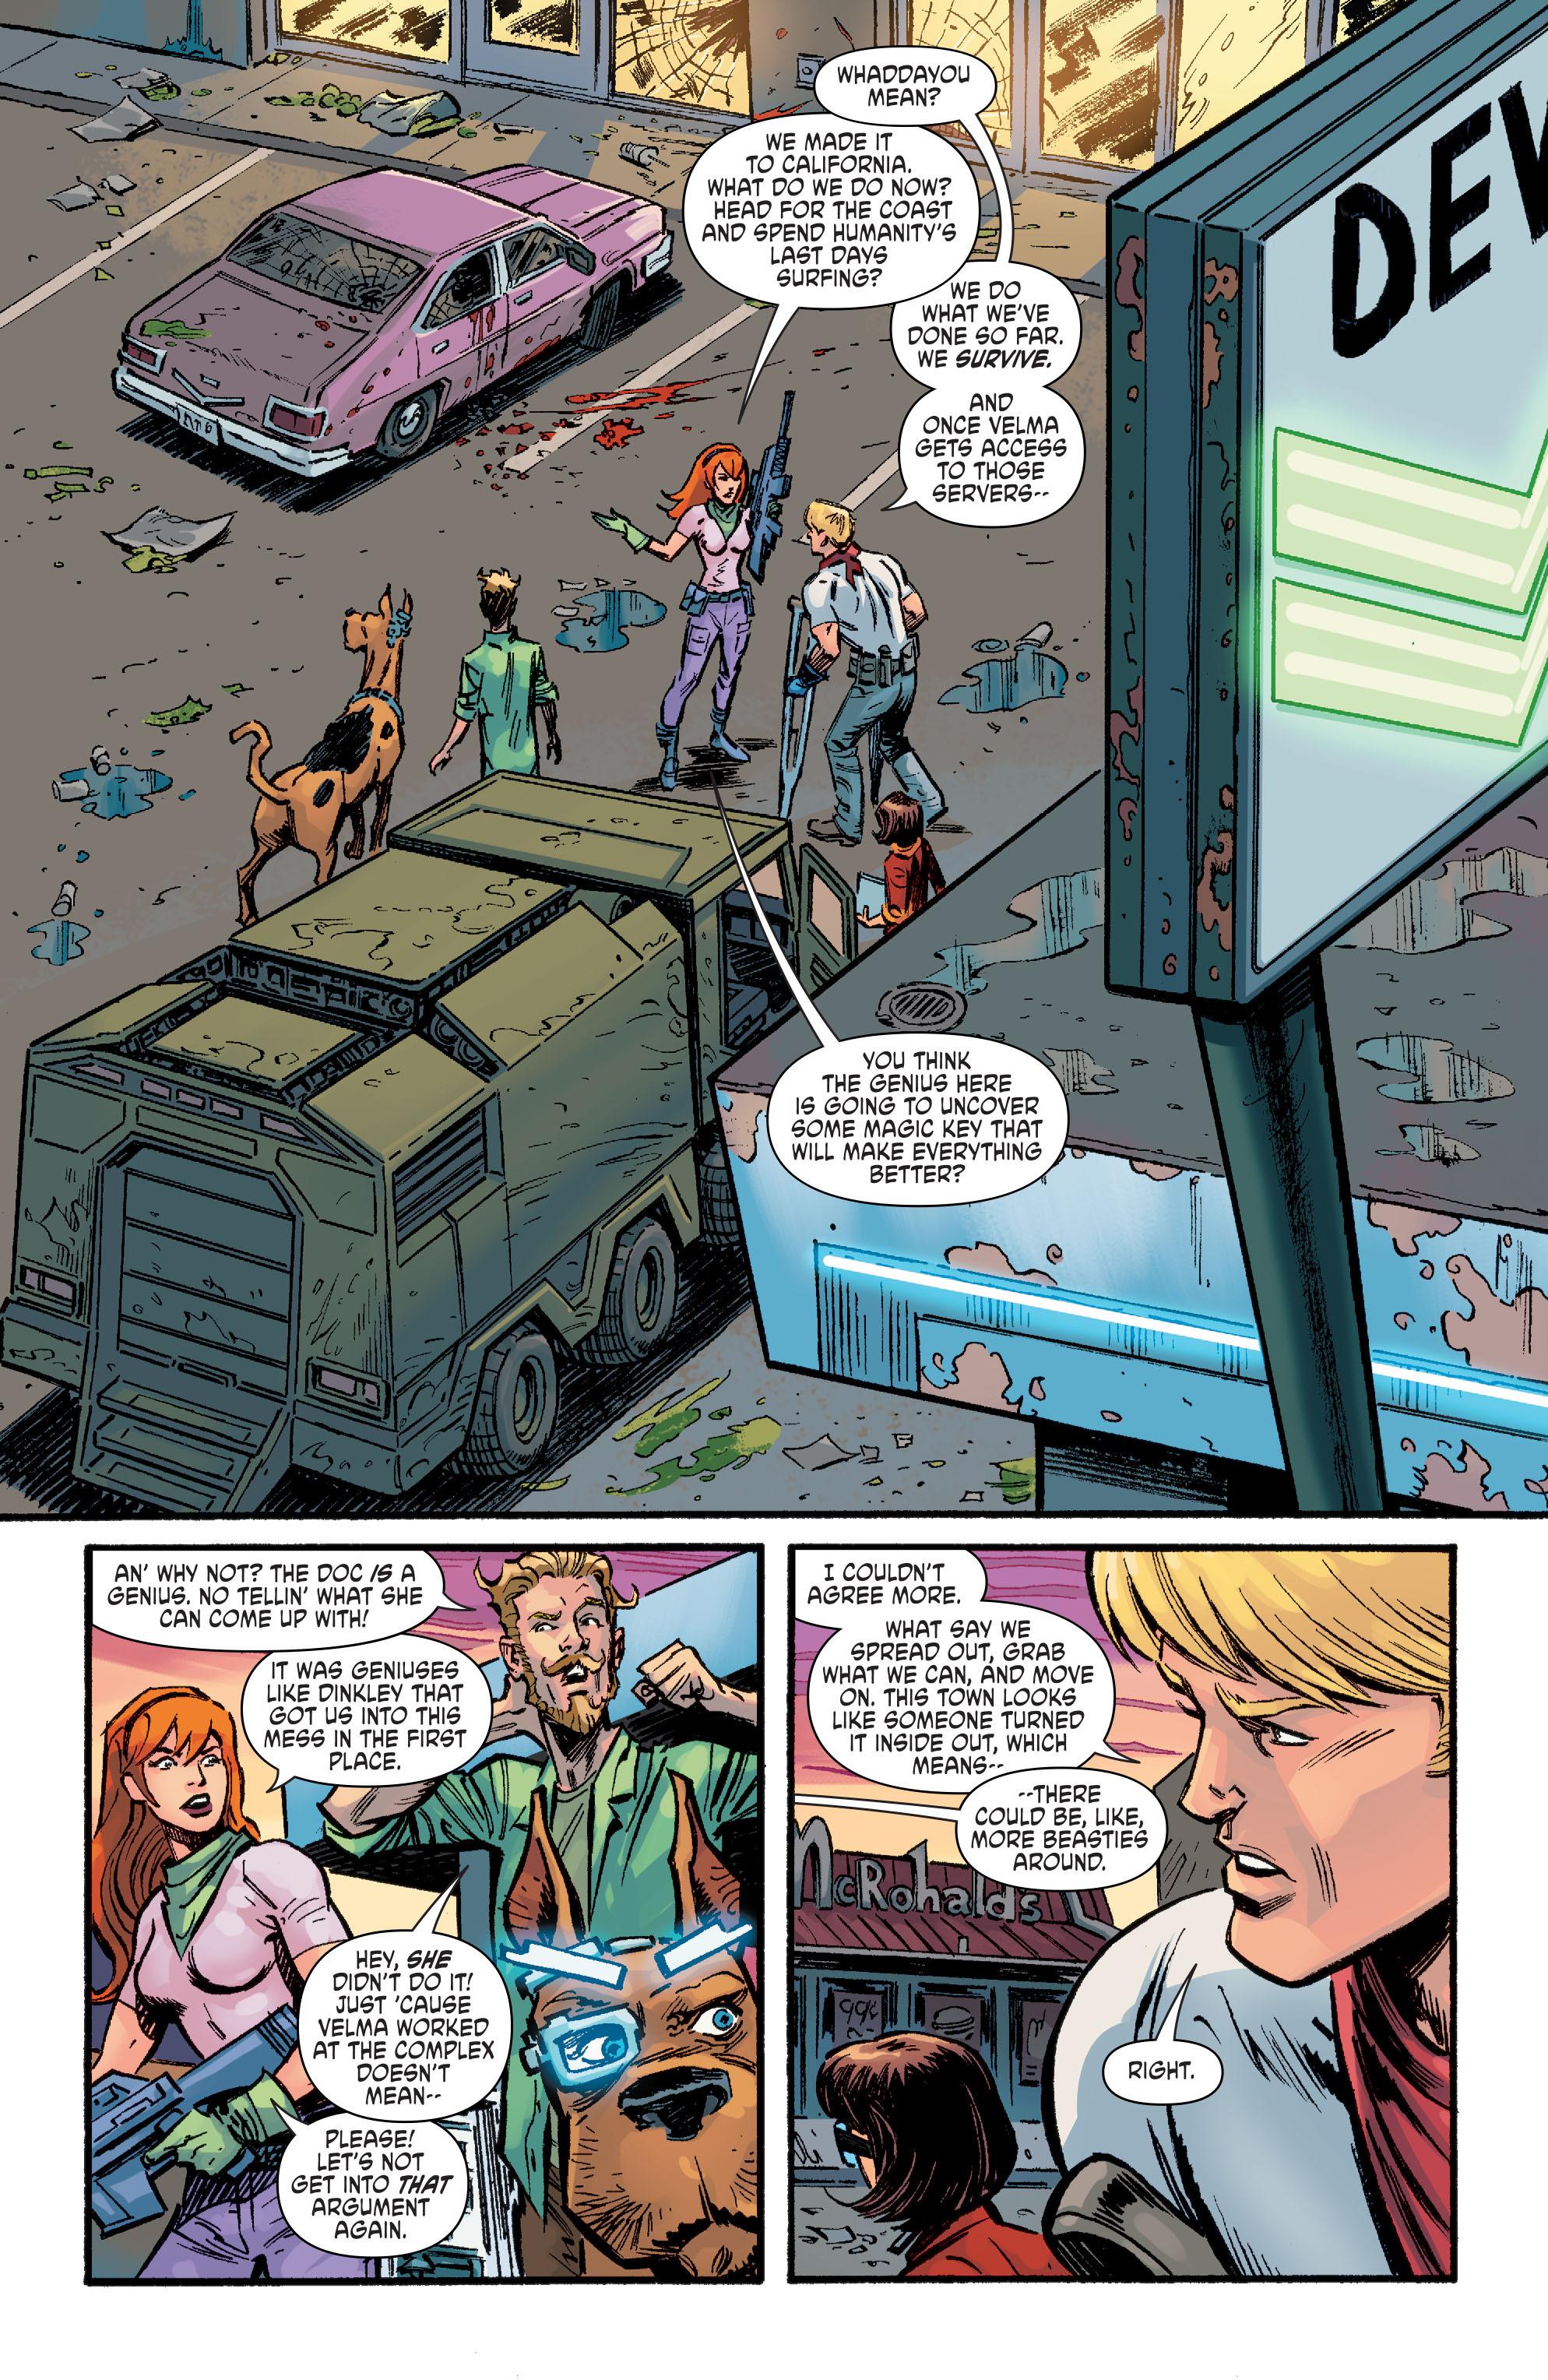 Read online Scooby Apocalypse comic -  Issue #9 - 10